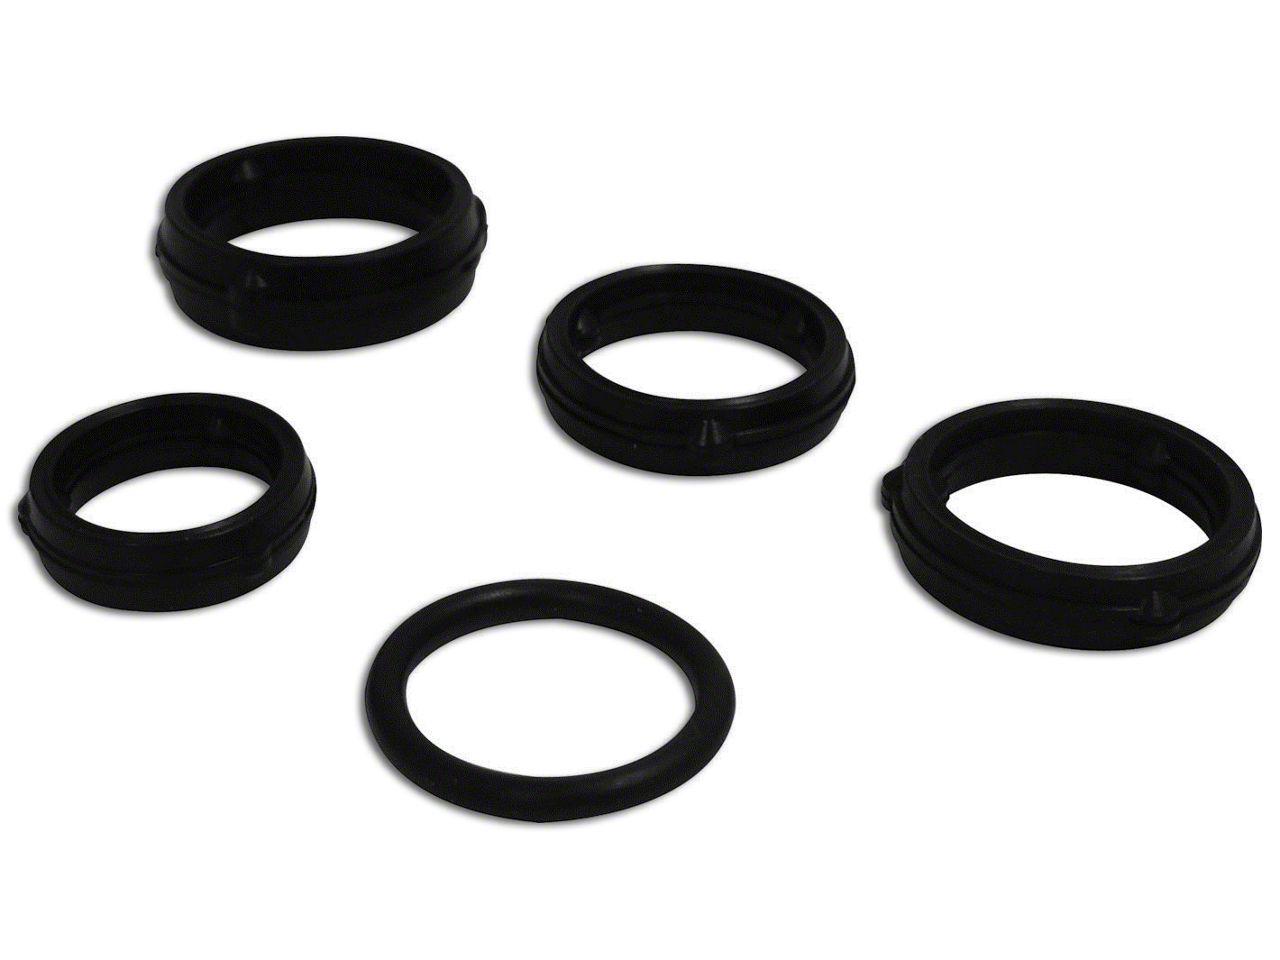 Oil Filter Adapter O-Ring Kit (12-13 3.6L Jeep Wrangler JK)